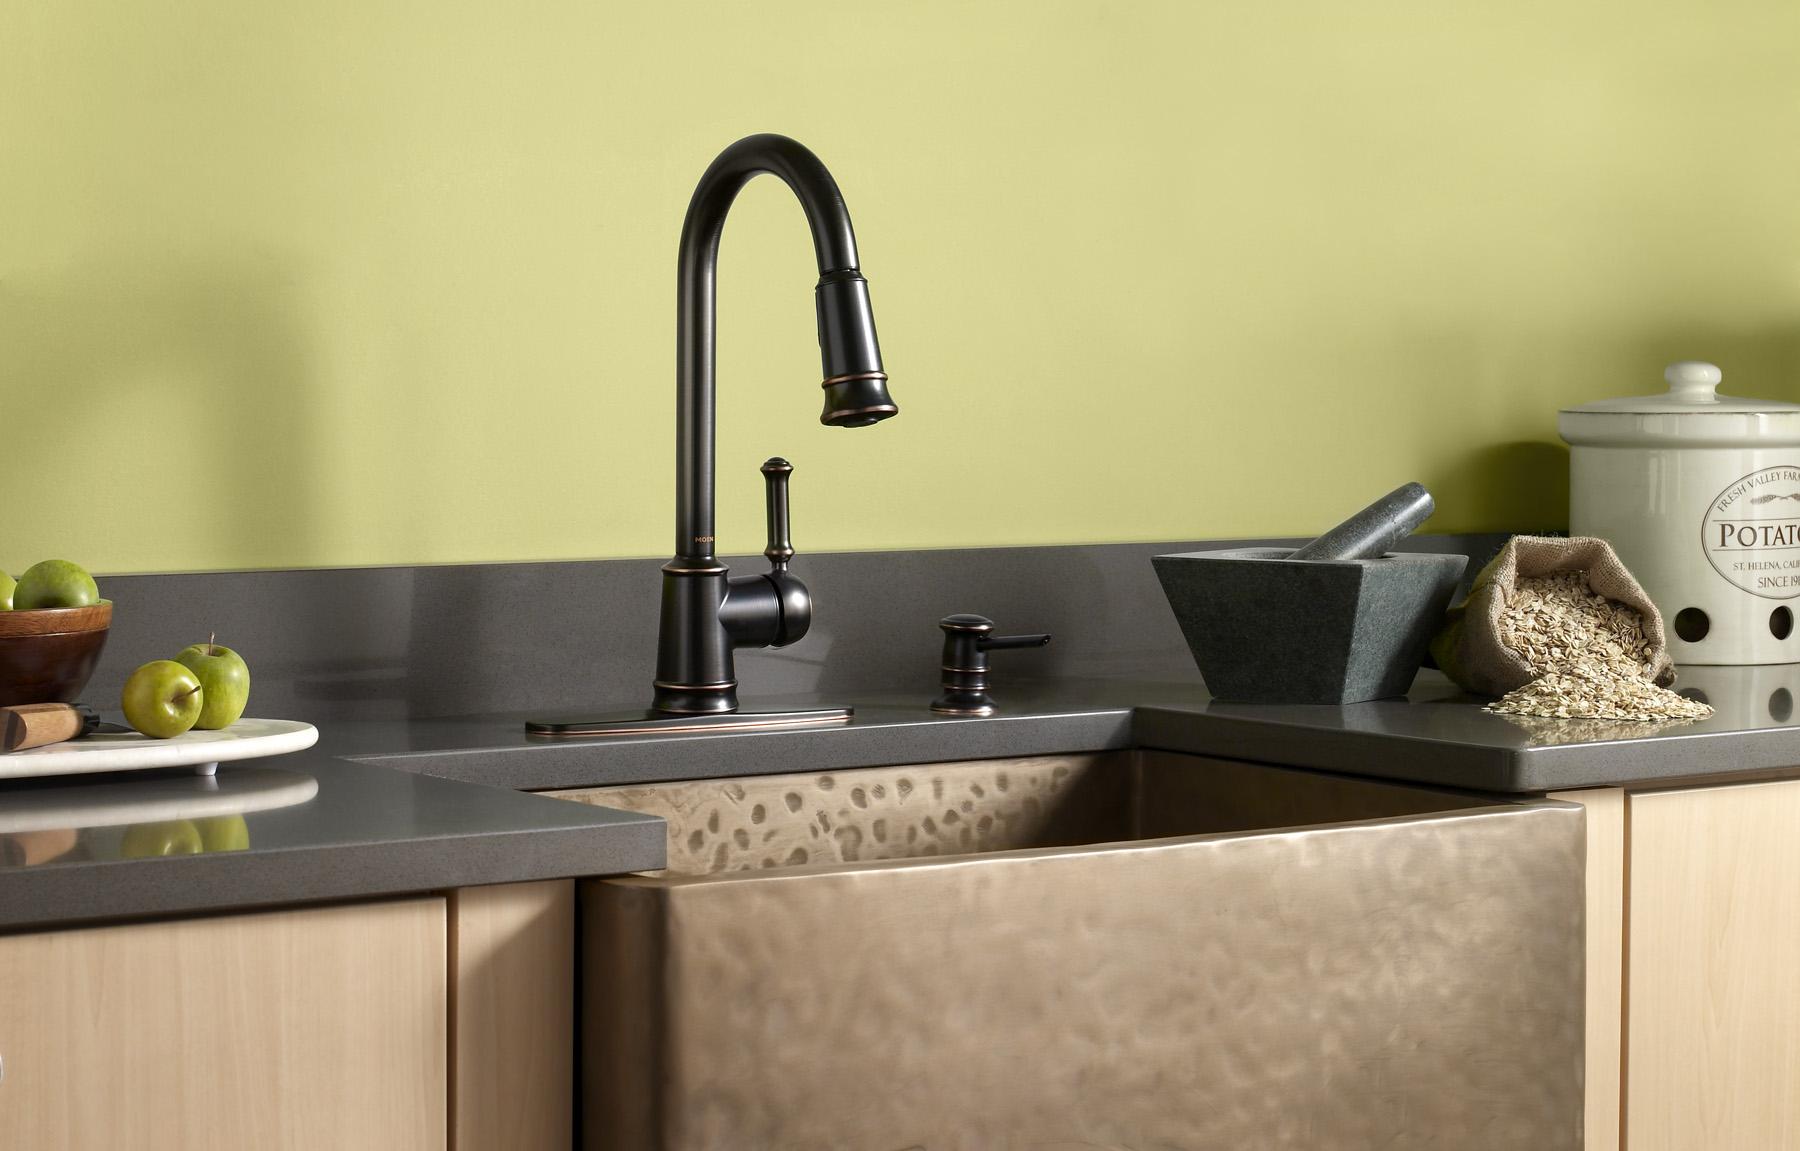 Remove moen kitchen faucet 7400 bearing cross